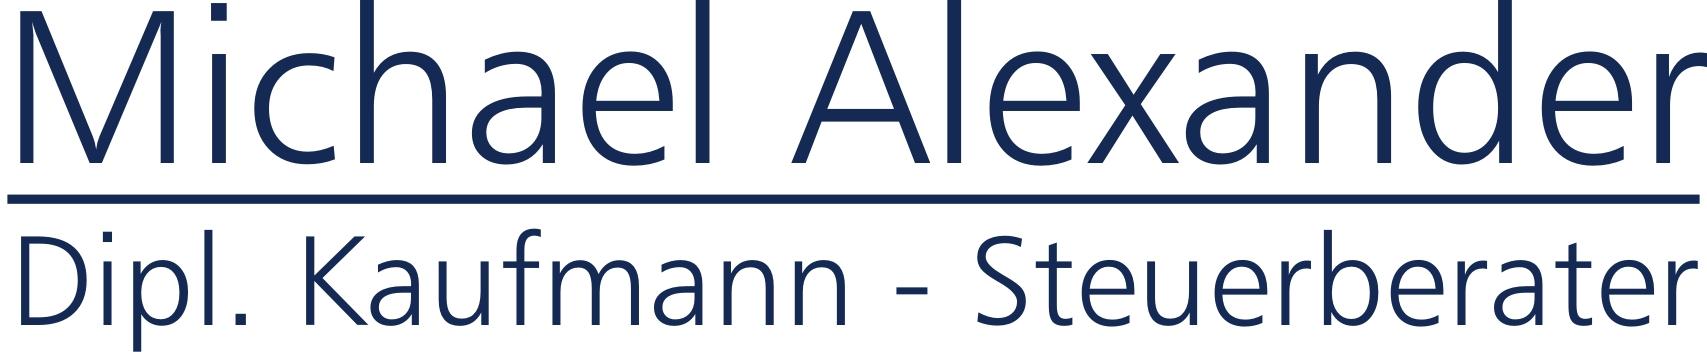 Steuerberater Michael Alexander Logo